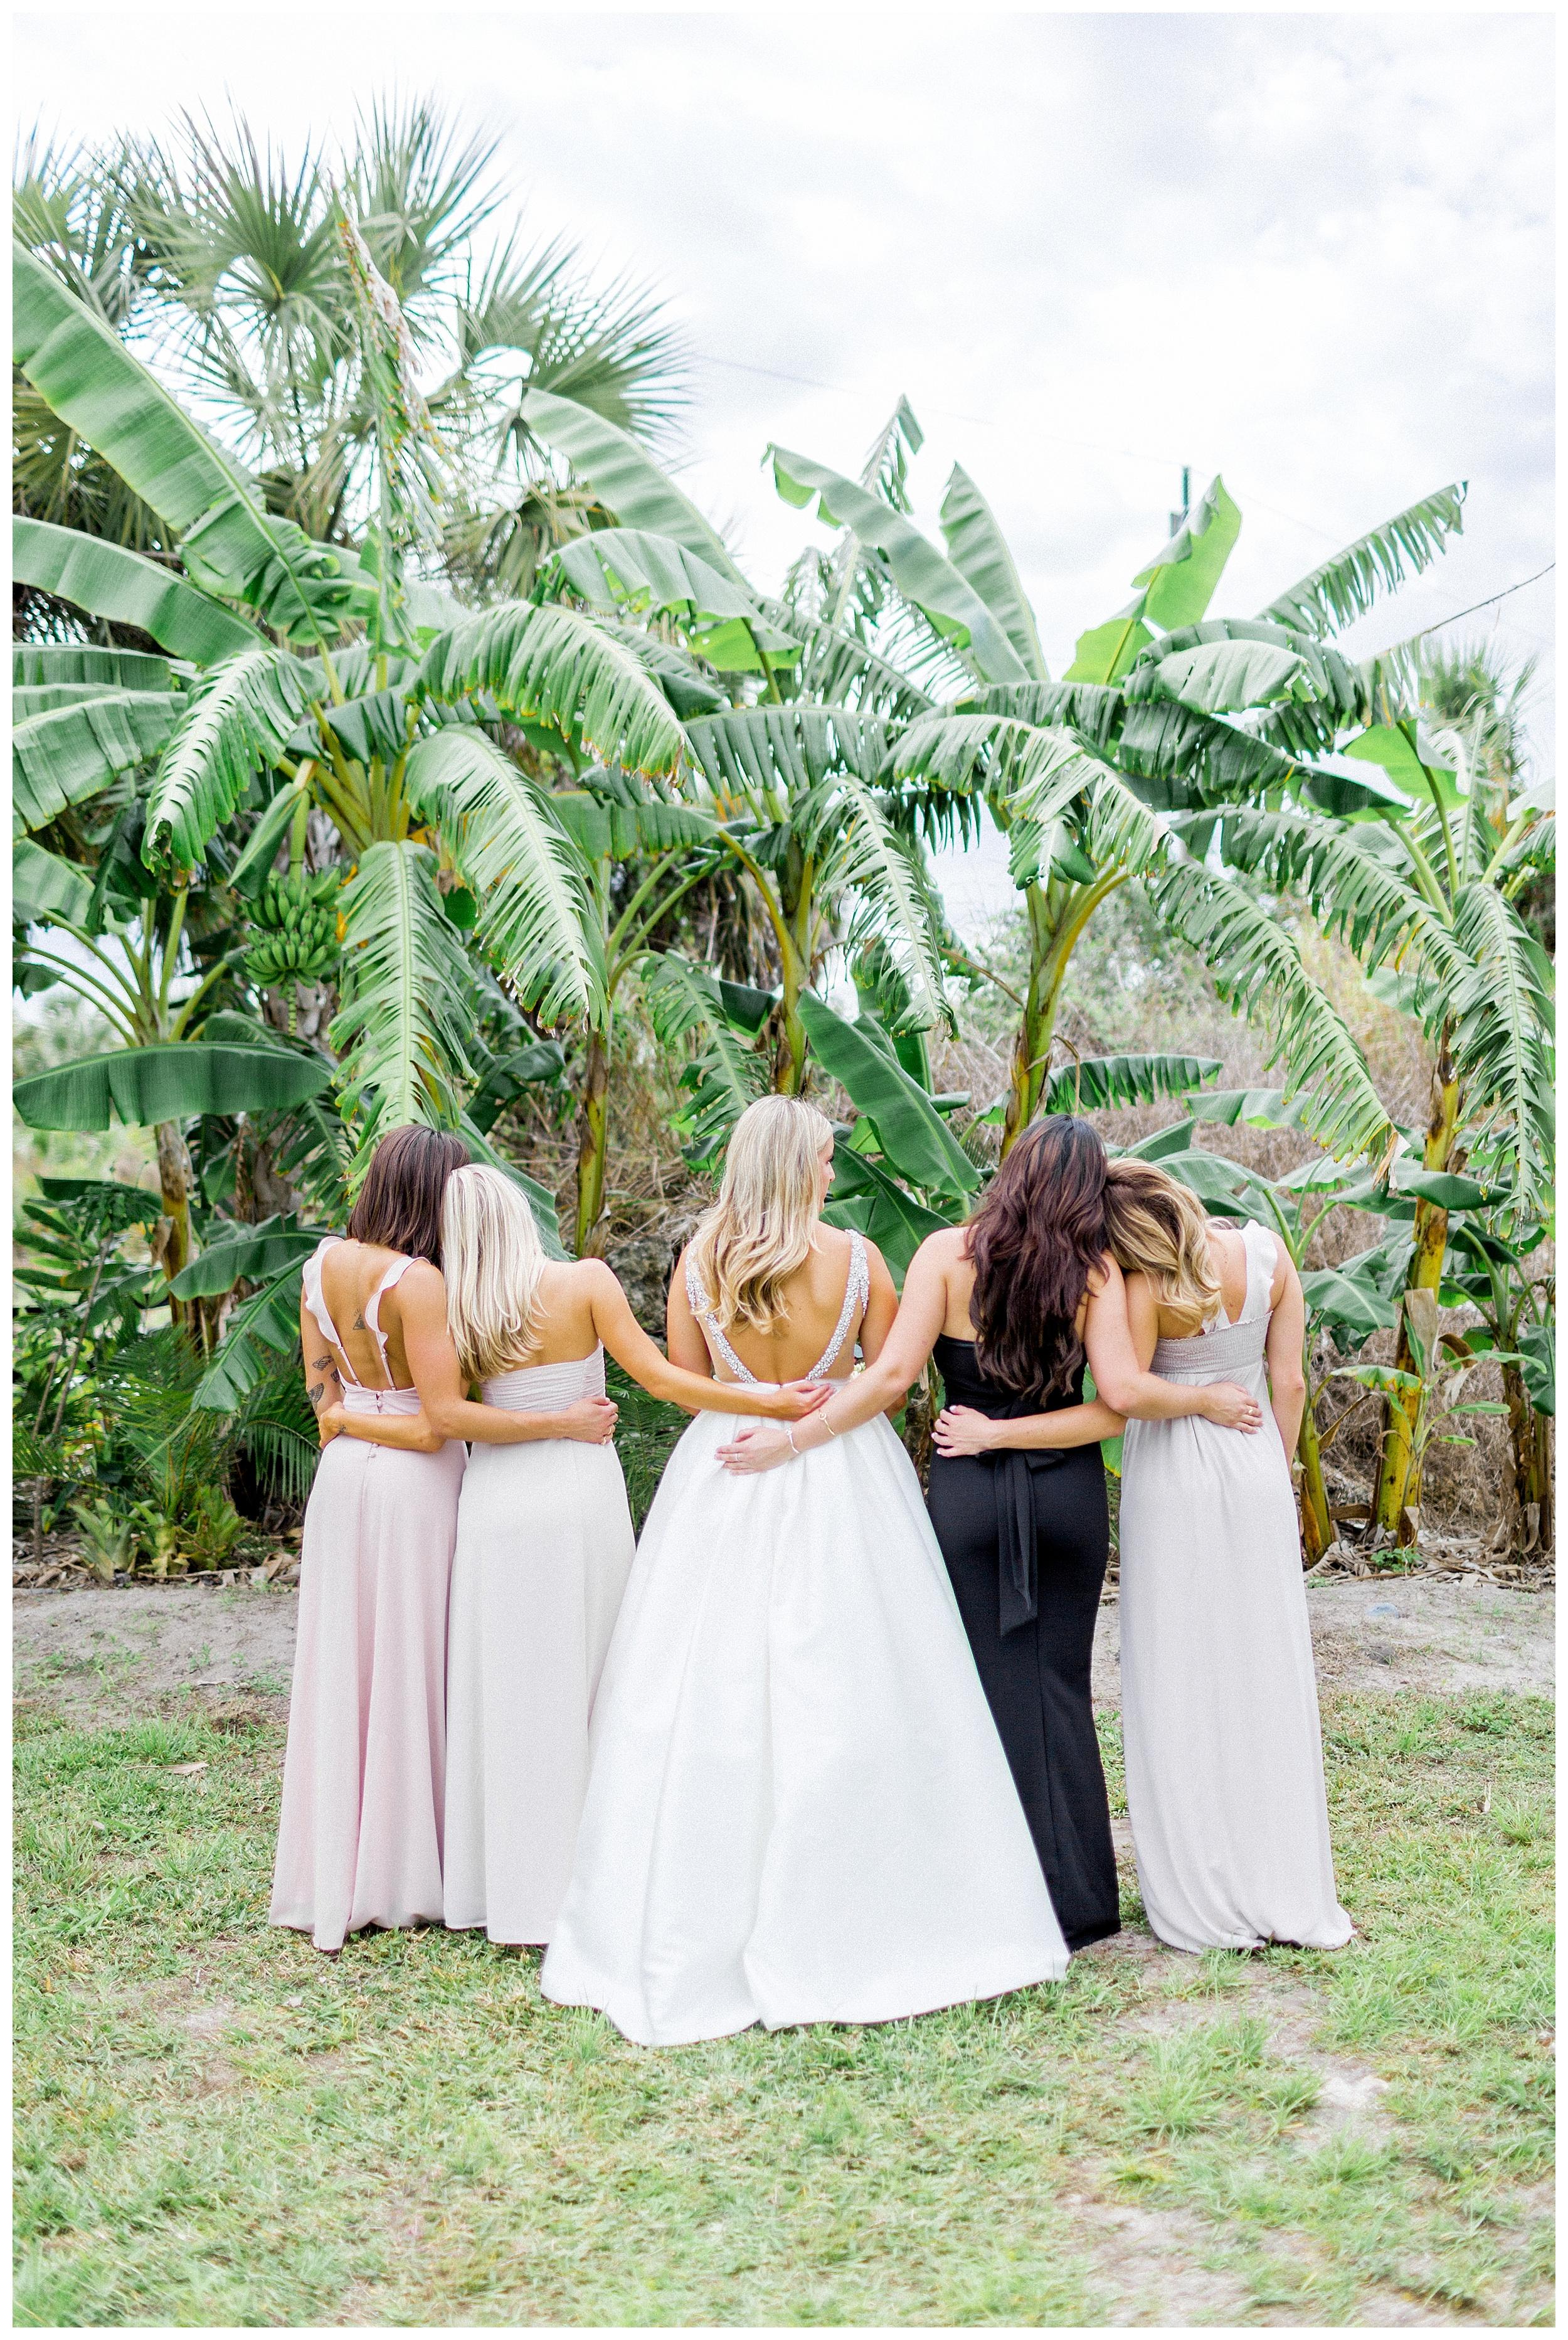 South Florida Wedding Photographer Kir Tuben_0058.jpg